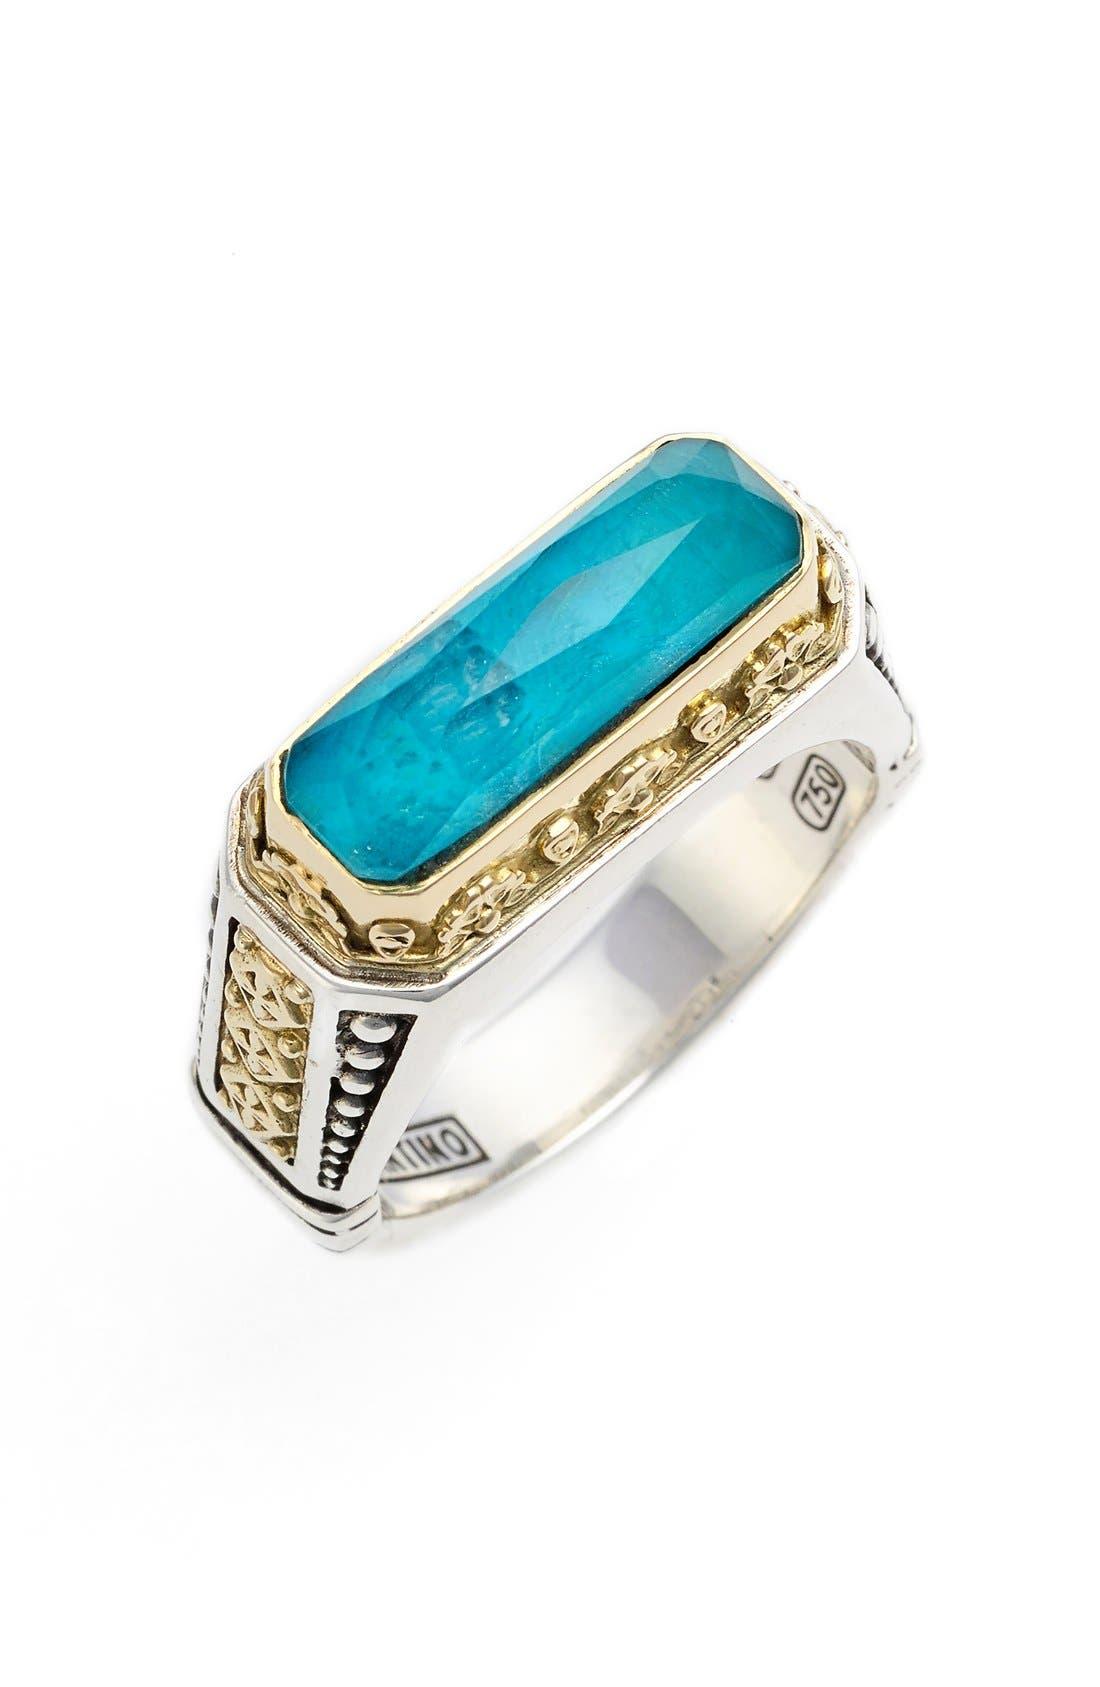 KONSTANTINO 'Iliada' Etched Ring